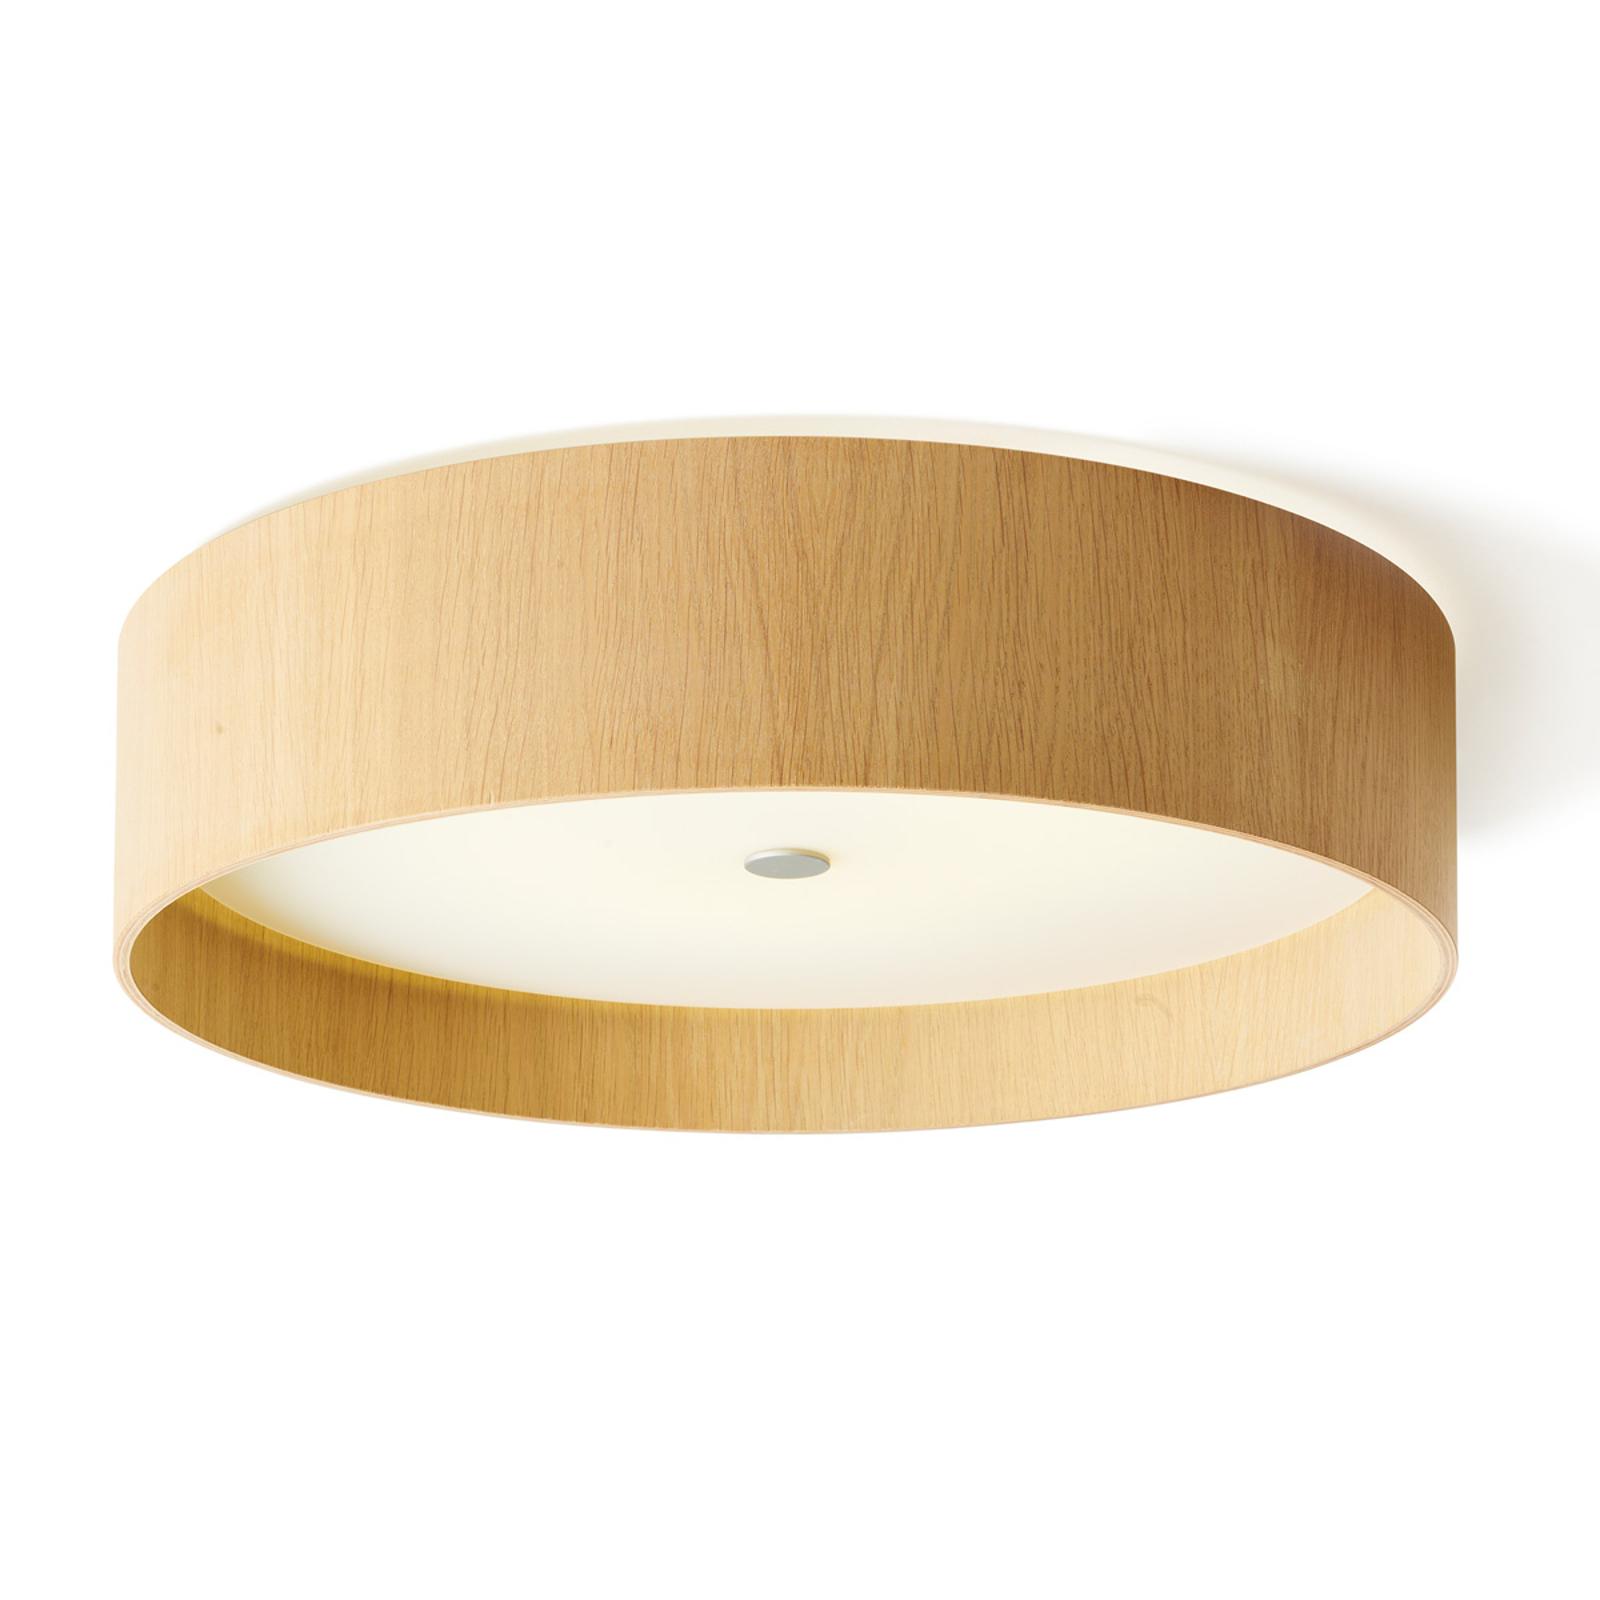 Lámpara LED de techo Lara wood circular roble 55cm